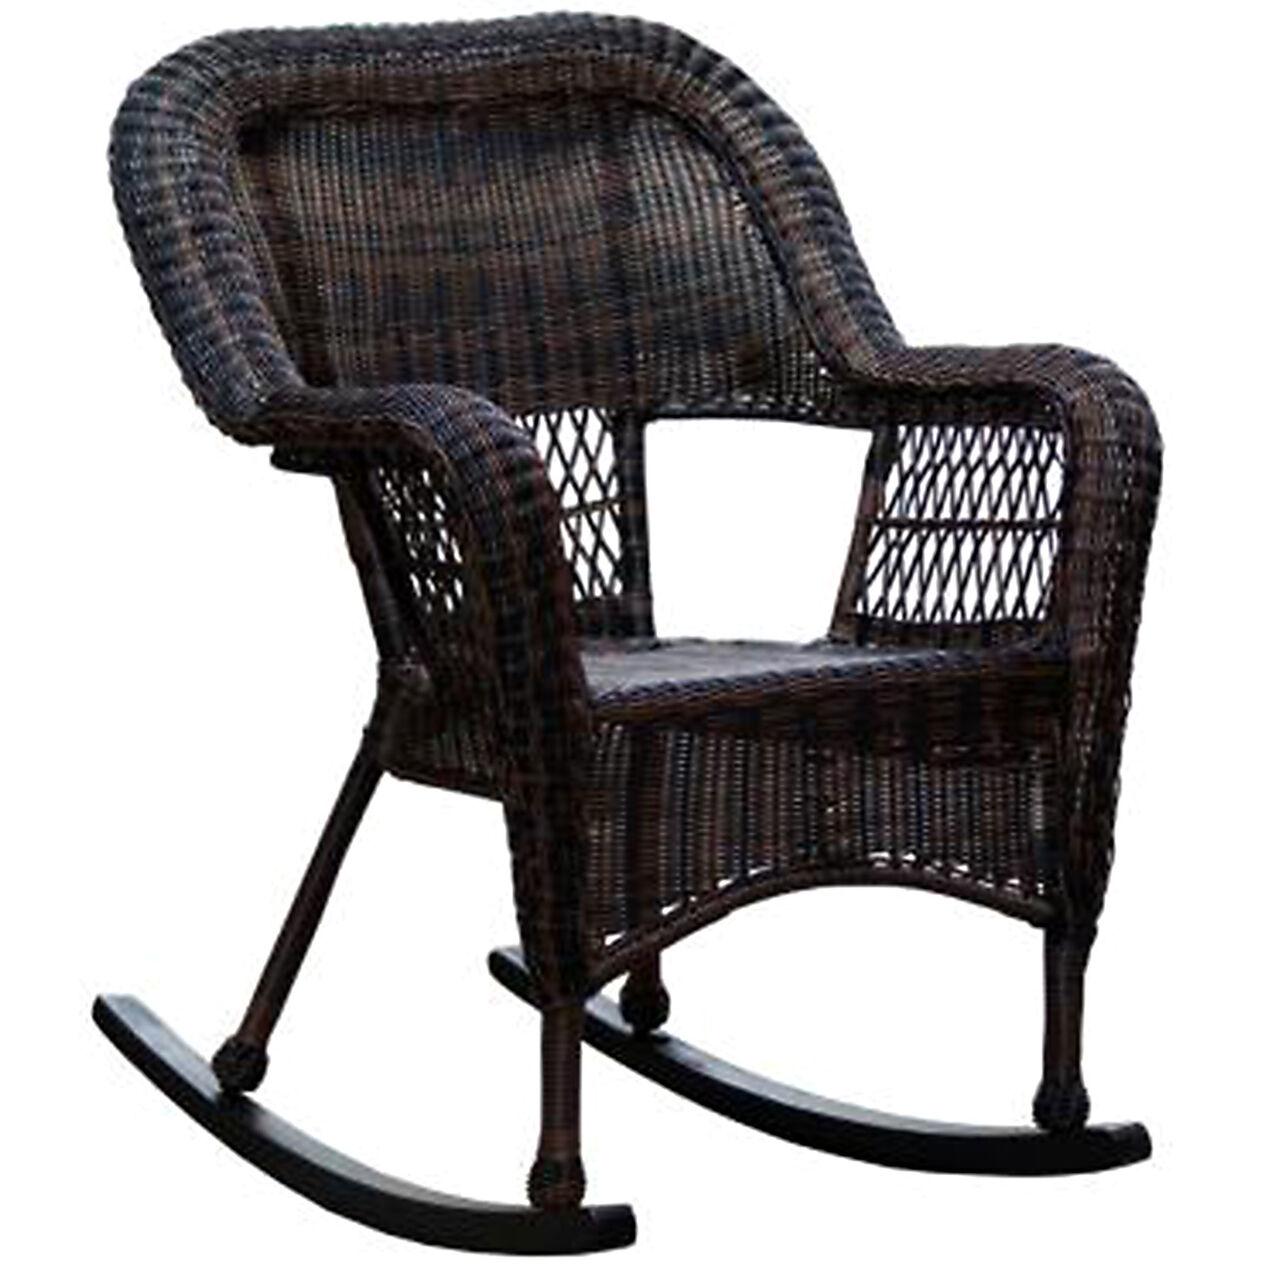 Ikea outdoor rocking chair - Dark Brown Wicker Outdoor Patio Rocking Chair At Home